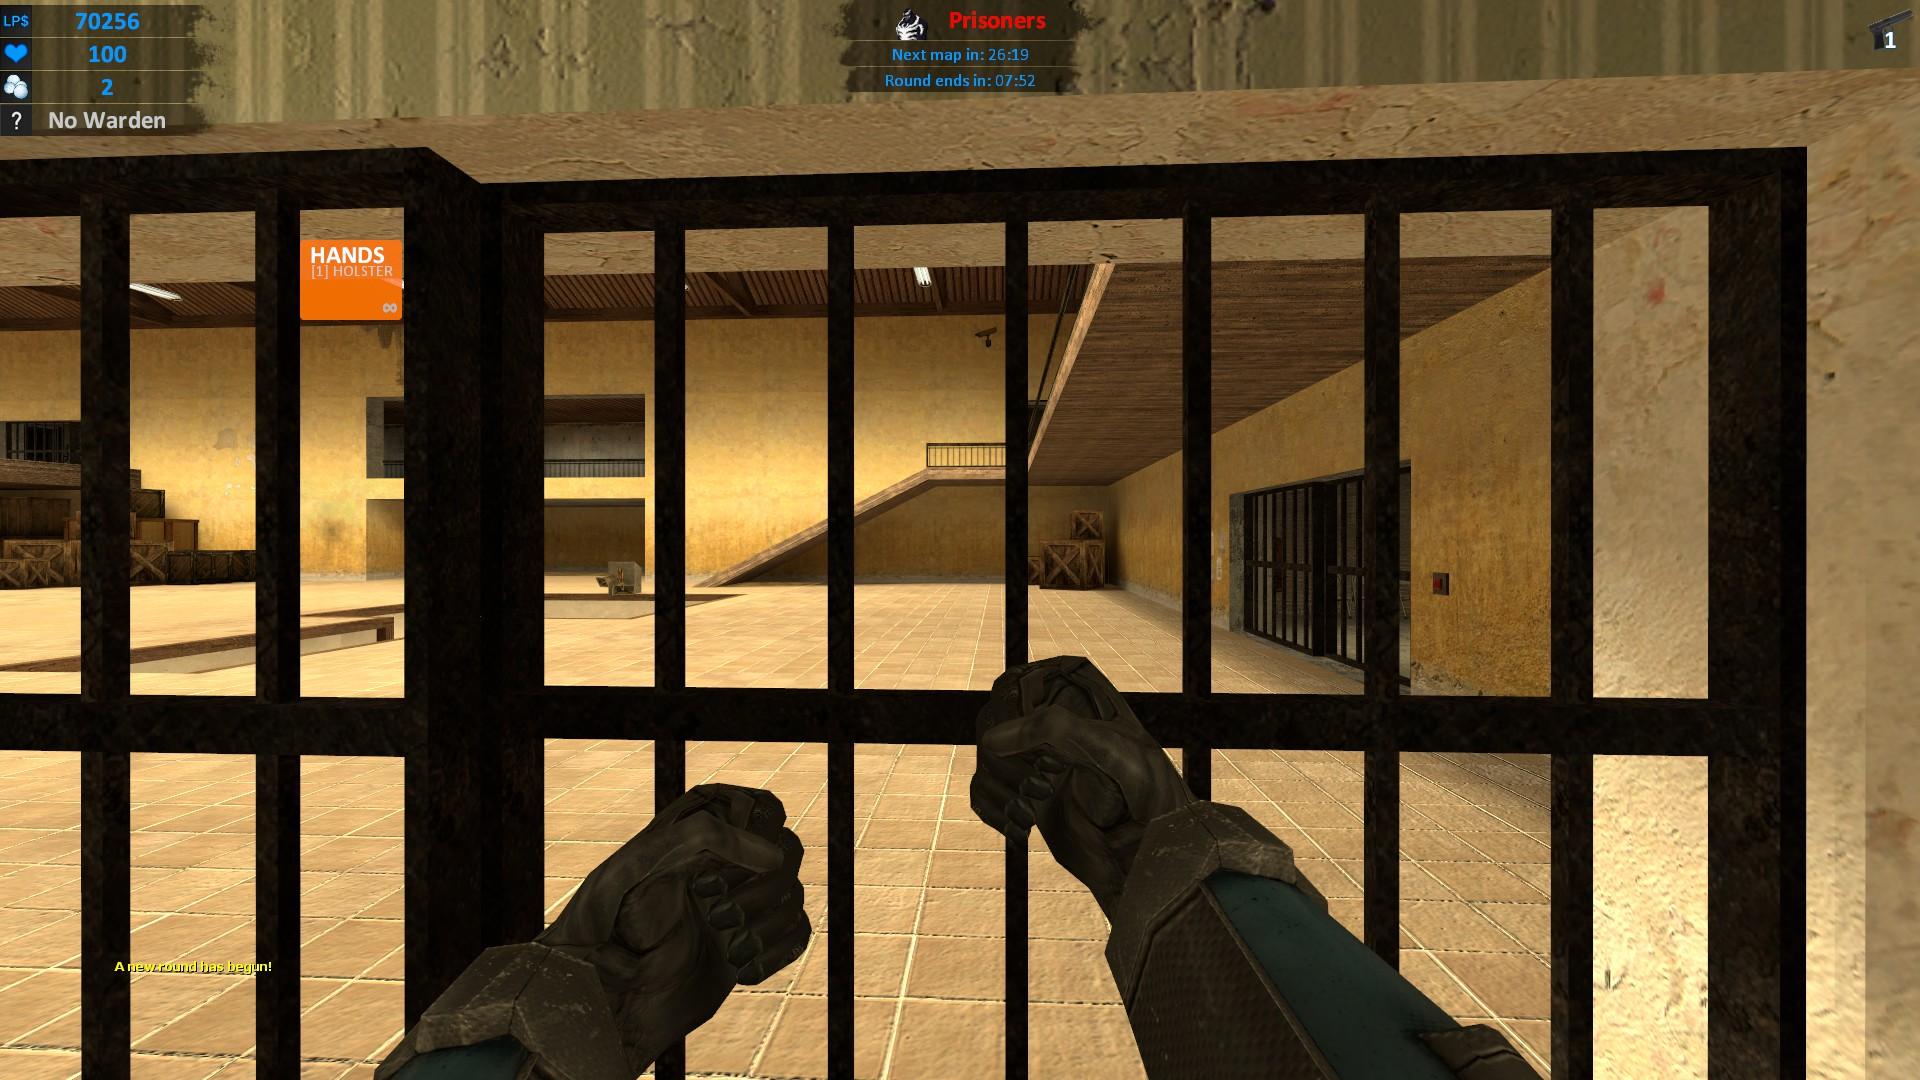 lifepunch jailbreak